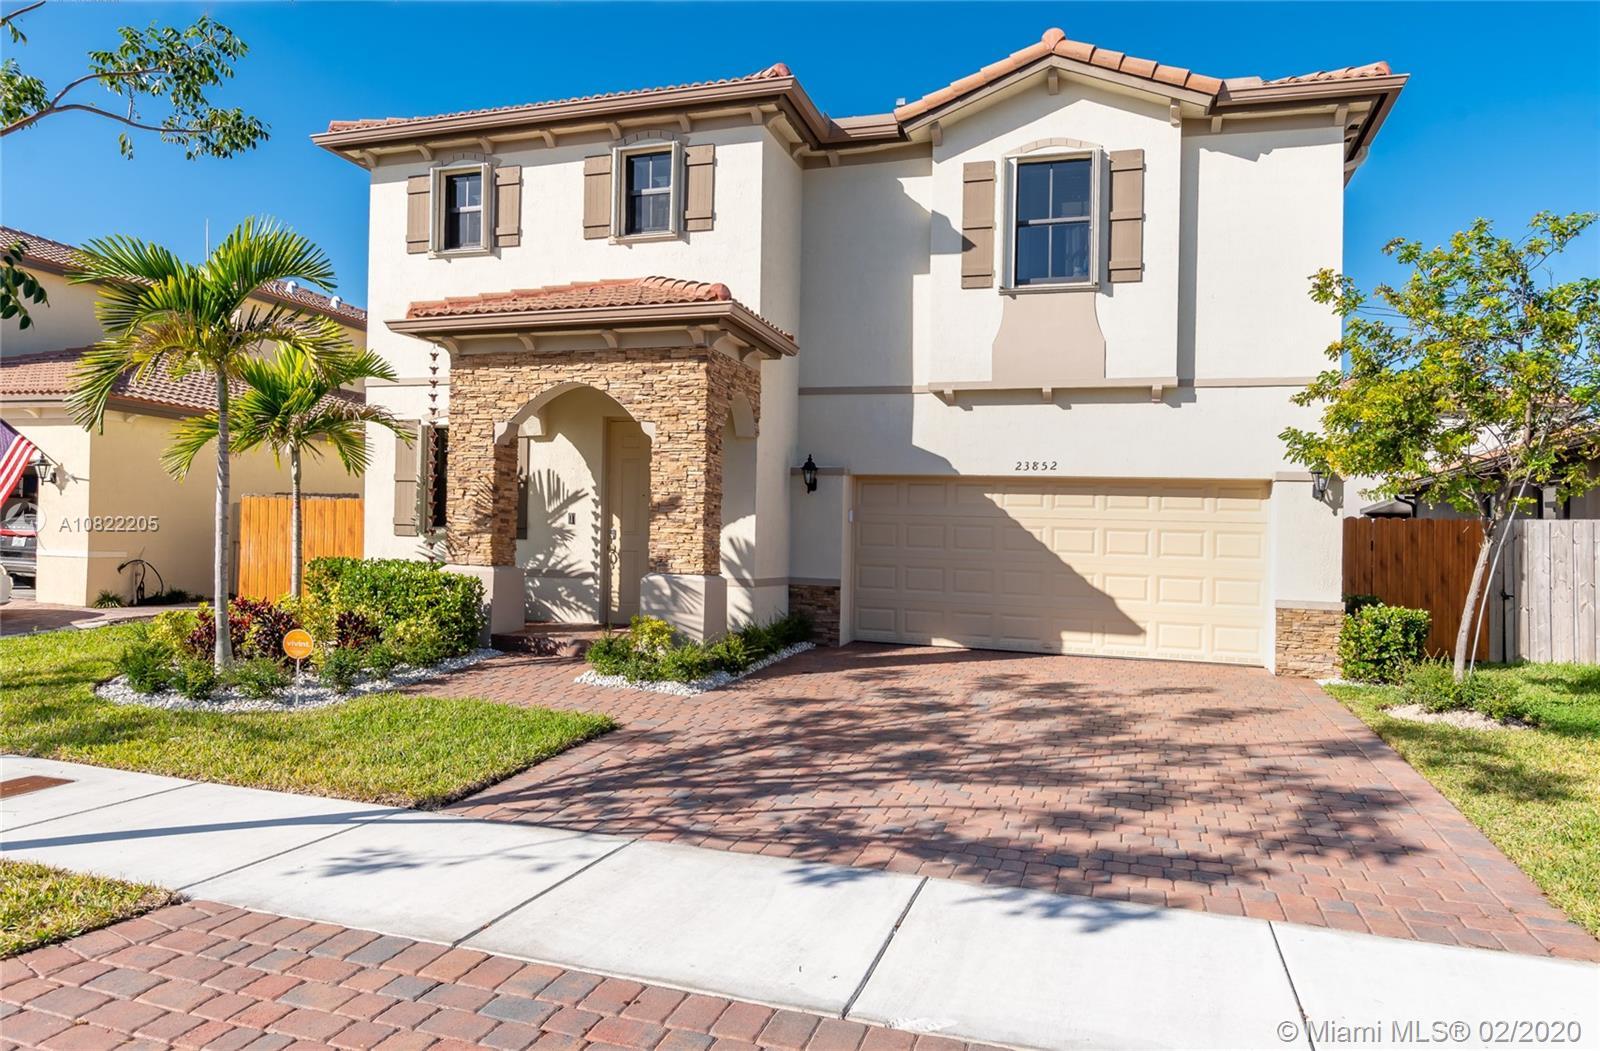 23852 SW 114th Pl #23852, Homestead, FL 33032 - Homestead, FL real estate listing